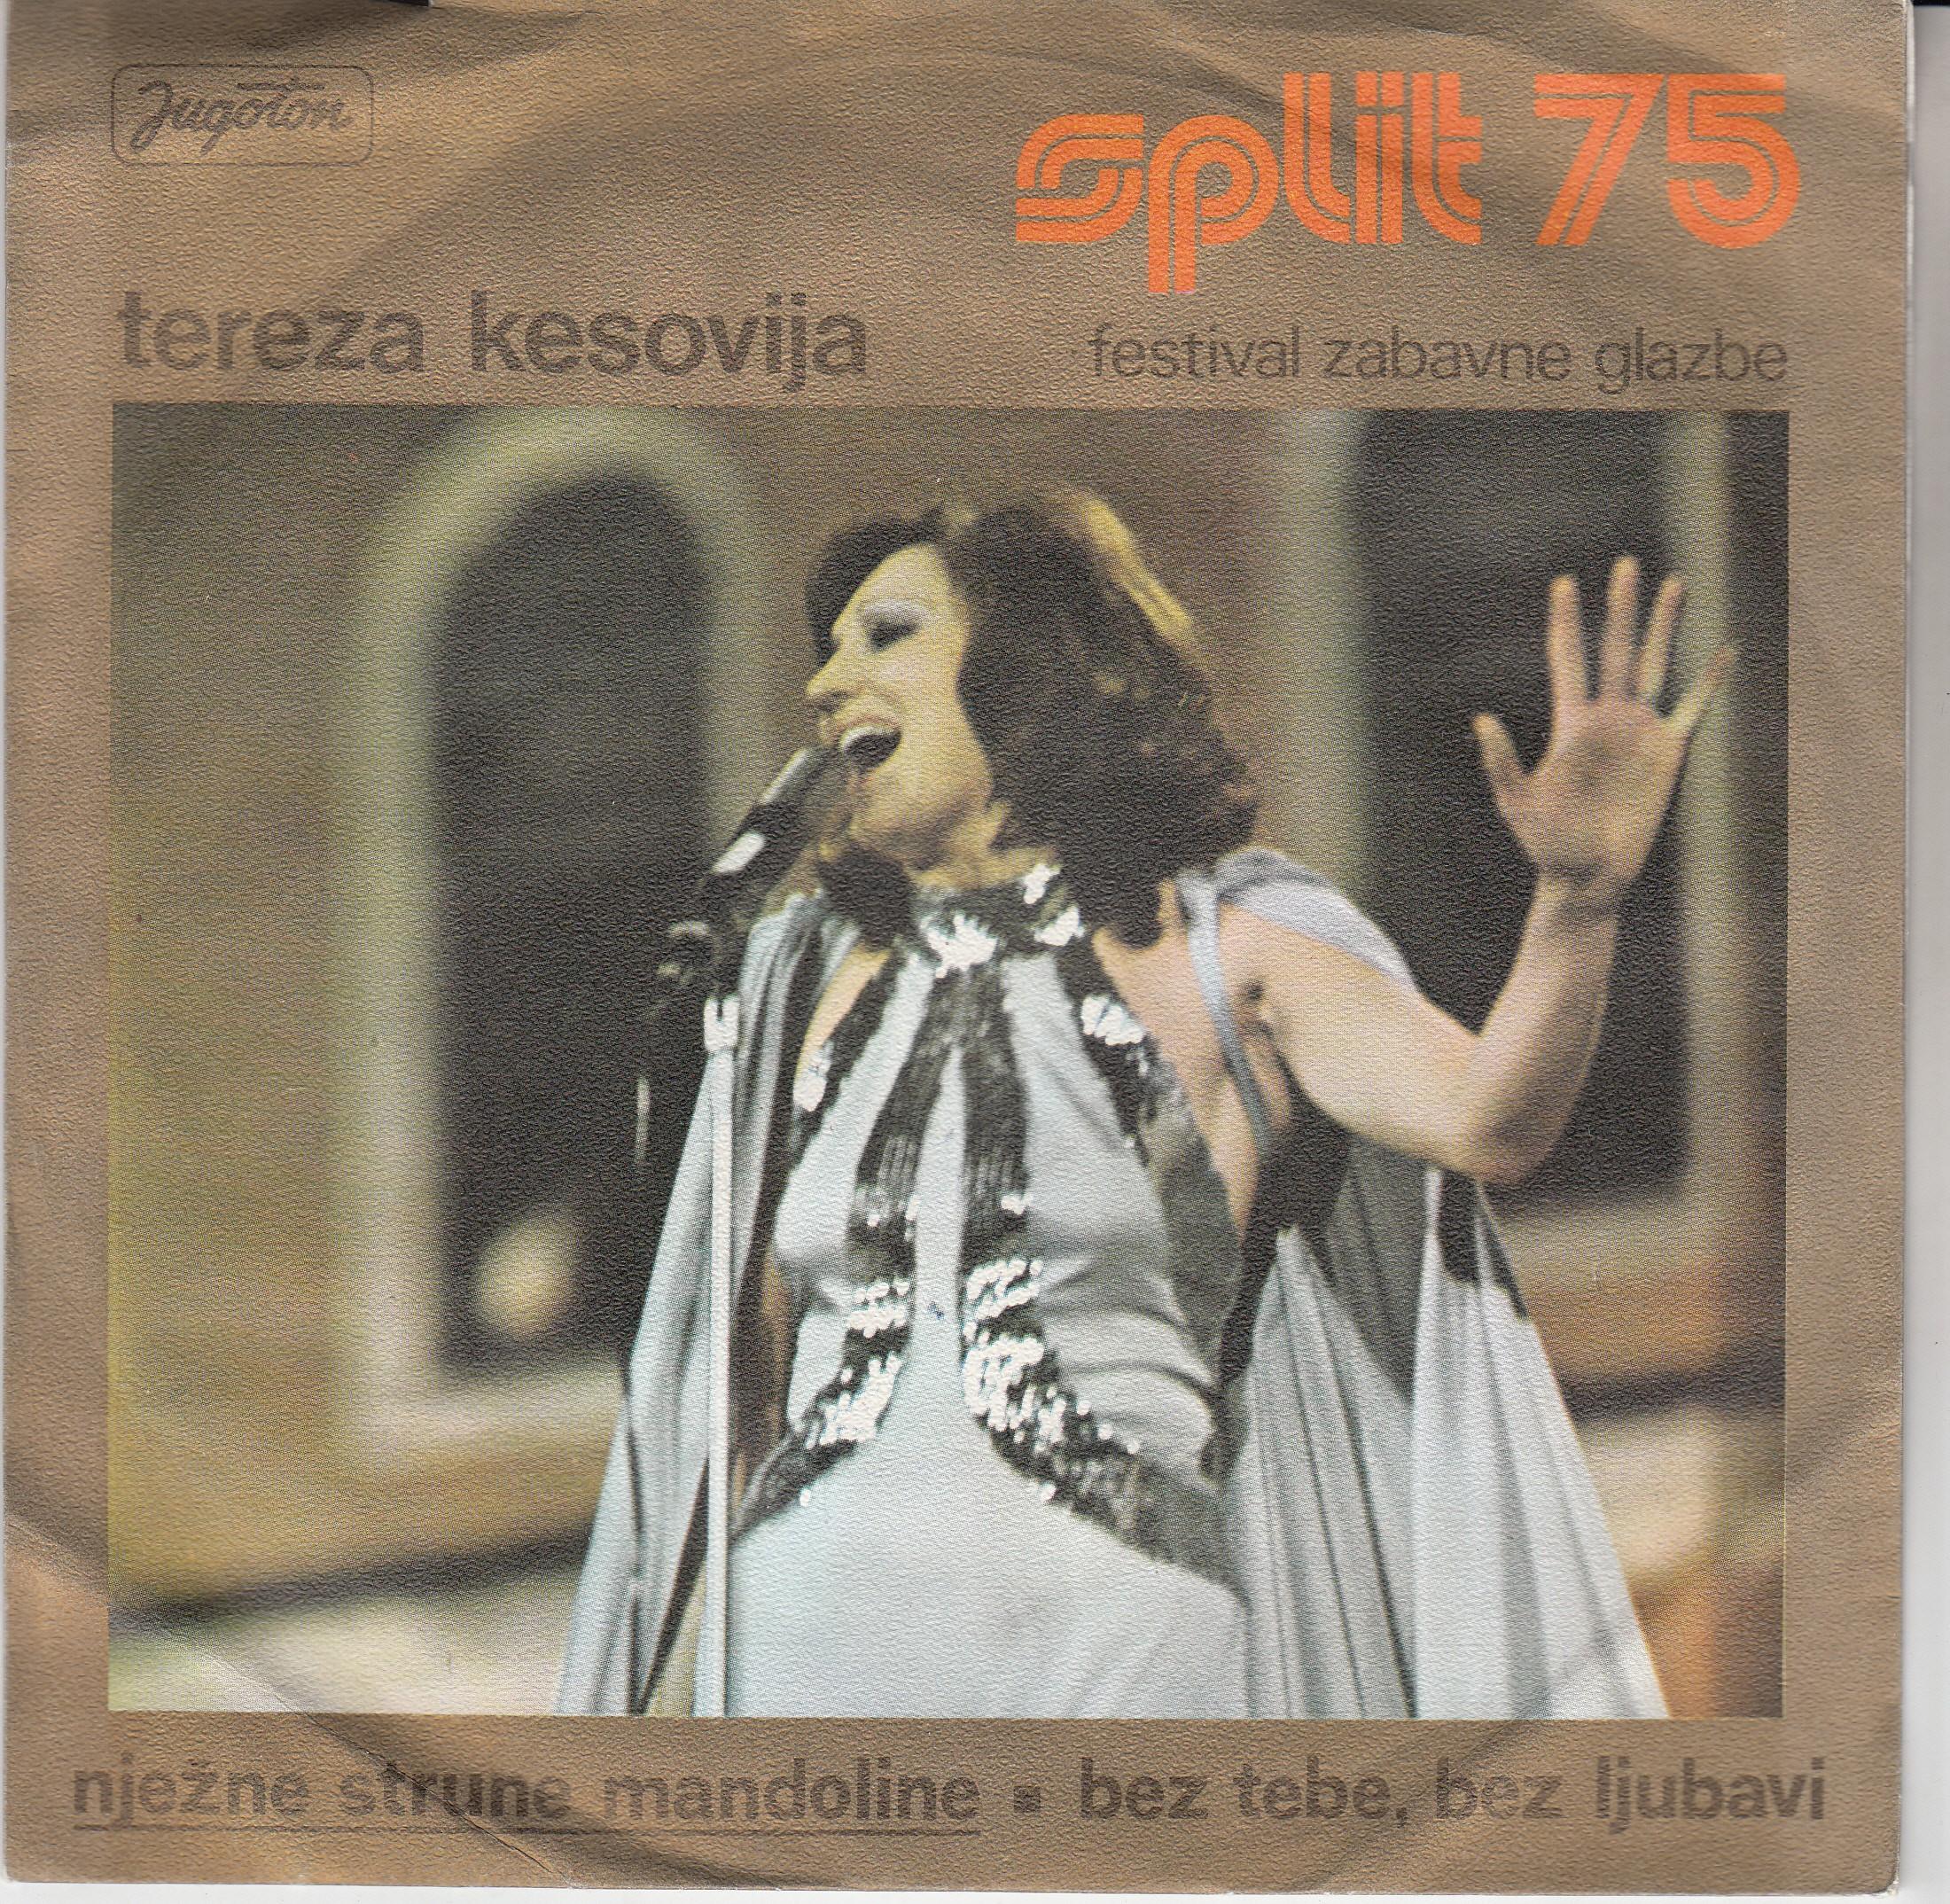 Kesovija Tereza - Njezne Strune Mandoline/bez Tebe Bez Ljubavi